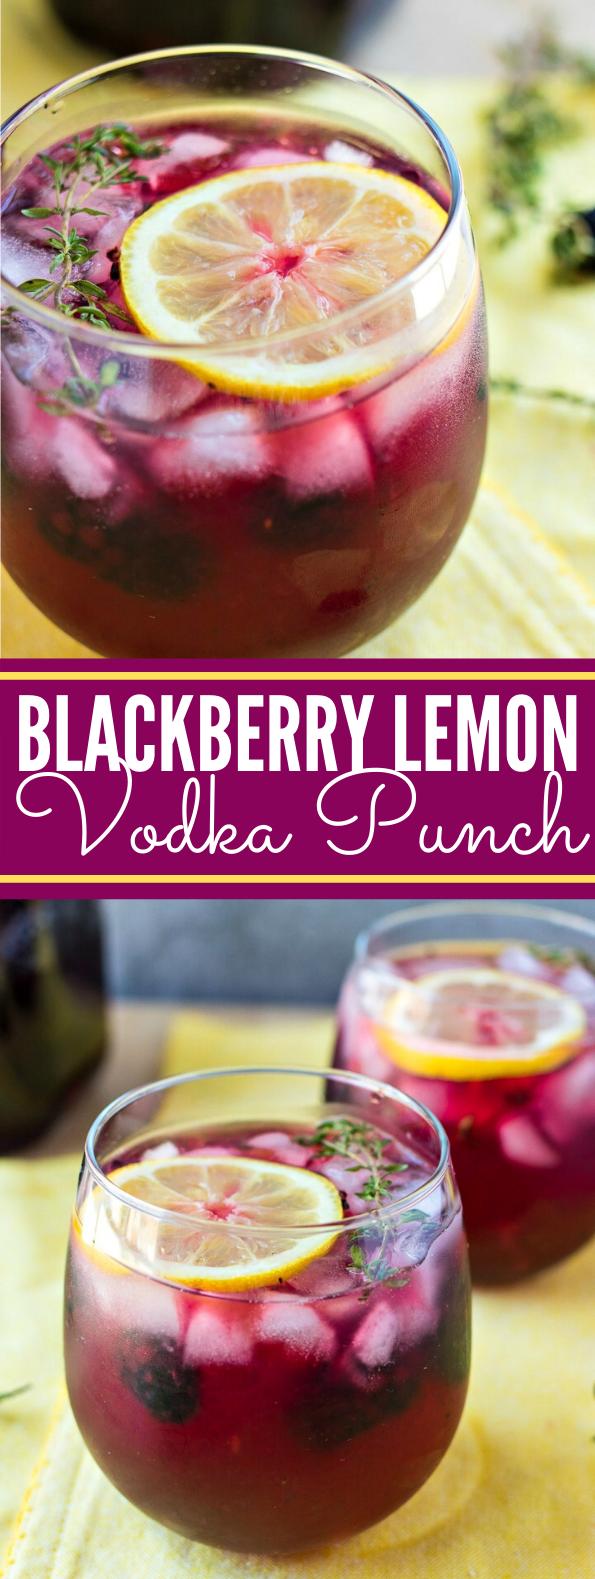 BLACKBERRY LEMON VODKA PUNCH DRINKS #cocktails #summerday #vodka #punch #drinks